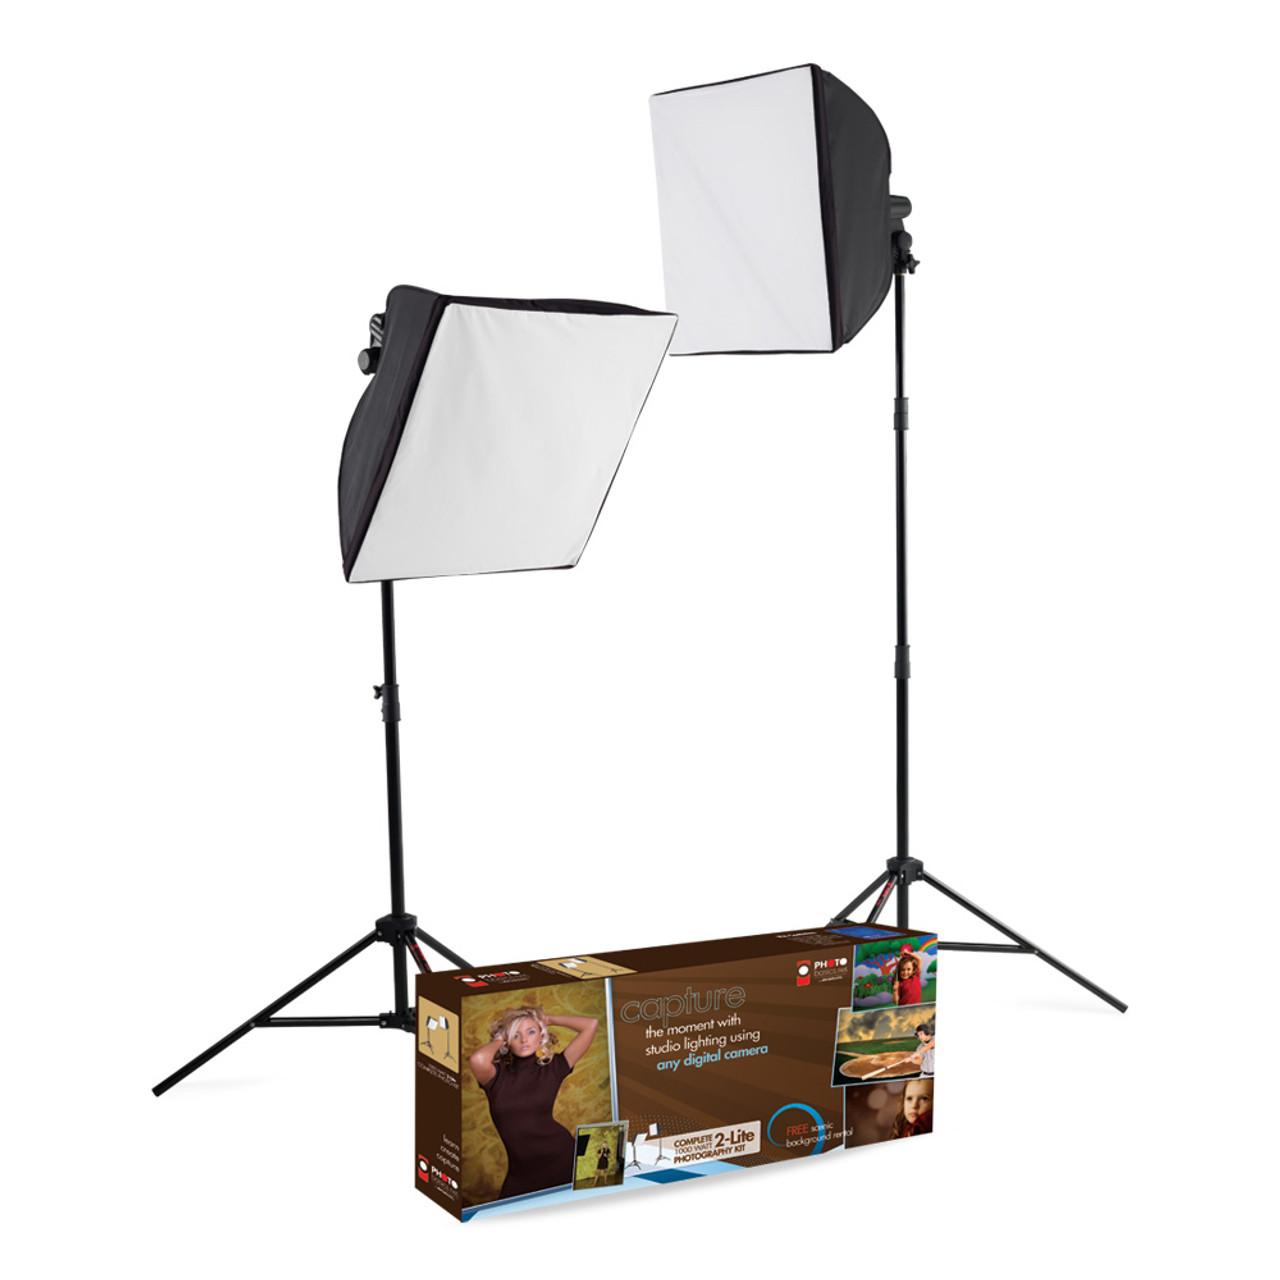 Westcott 2-Light uLite Kit with Free Scenic Rental